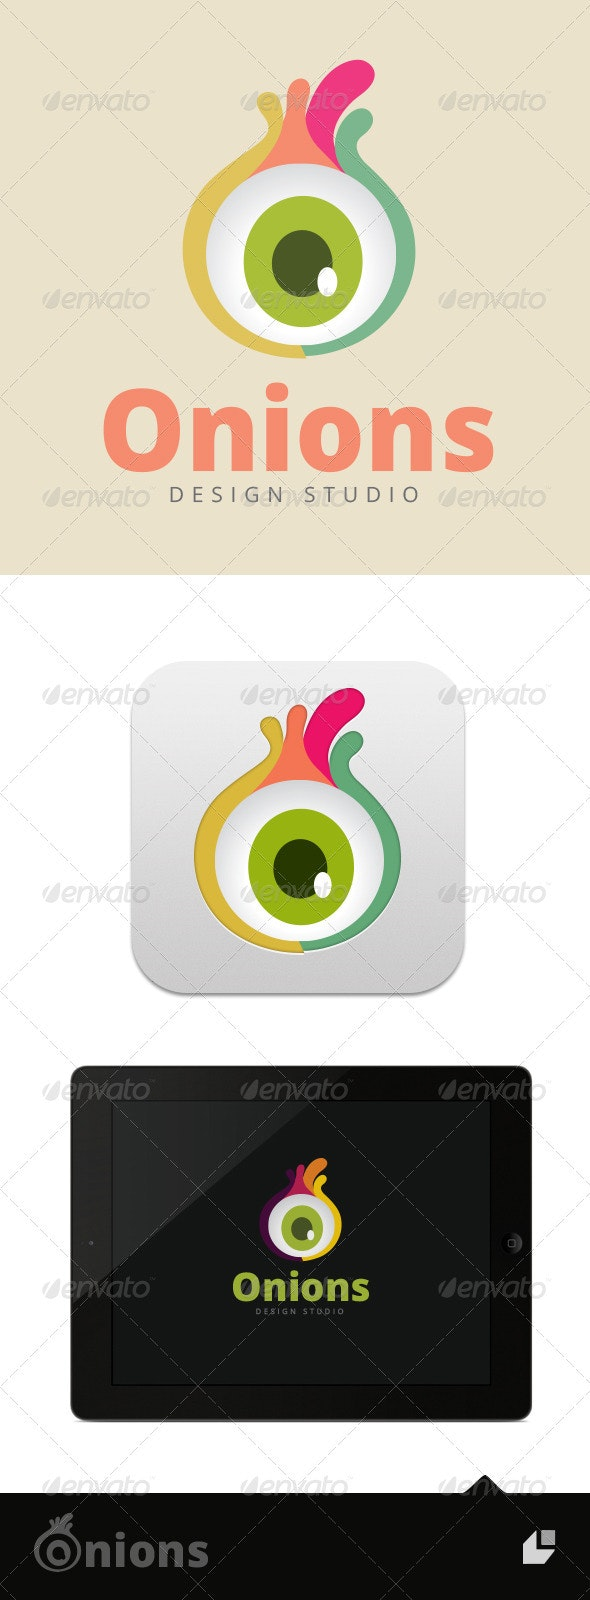 Onions Studio Logo - Vector Abstract